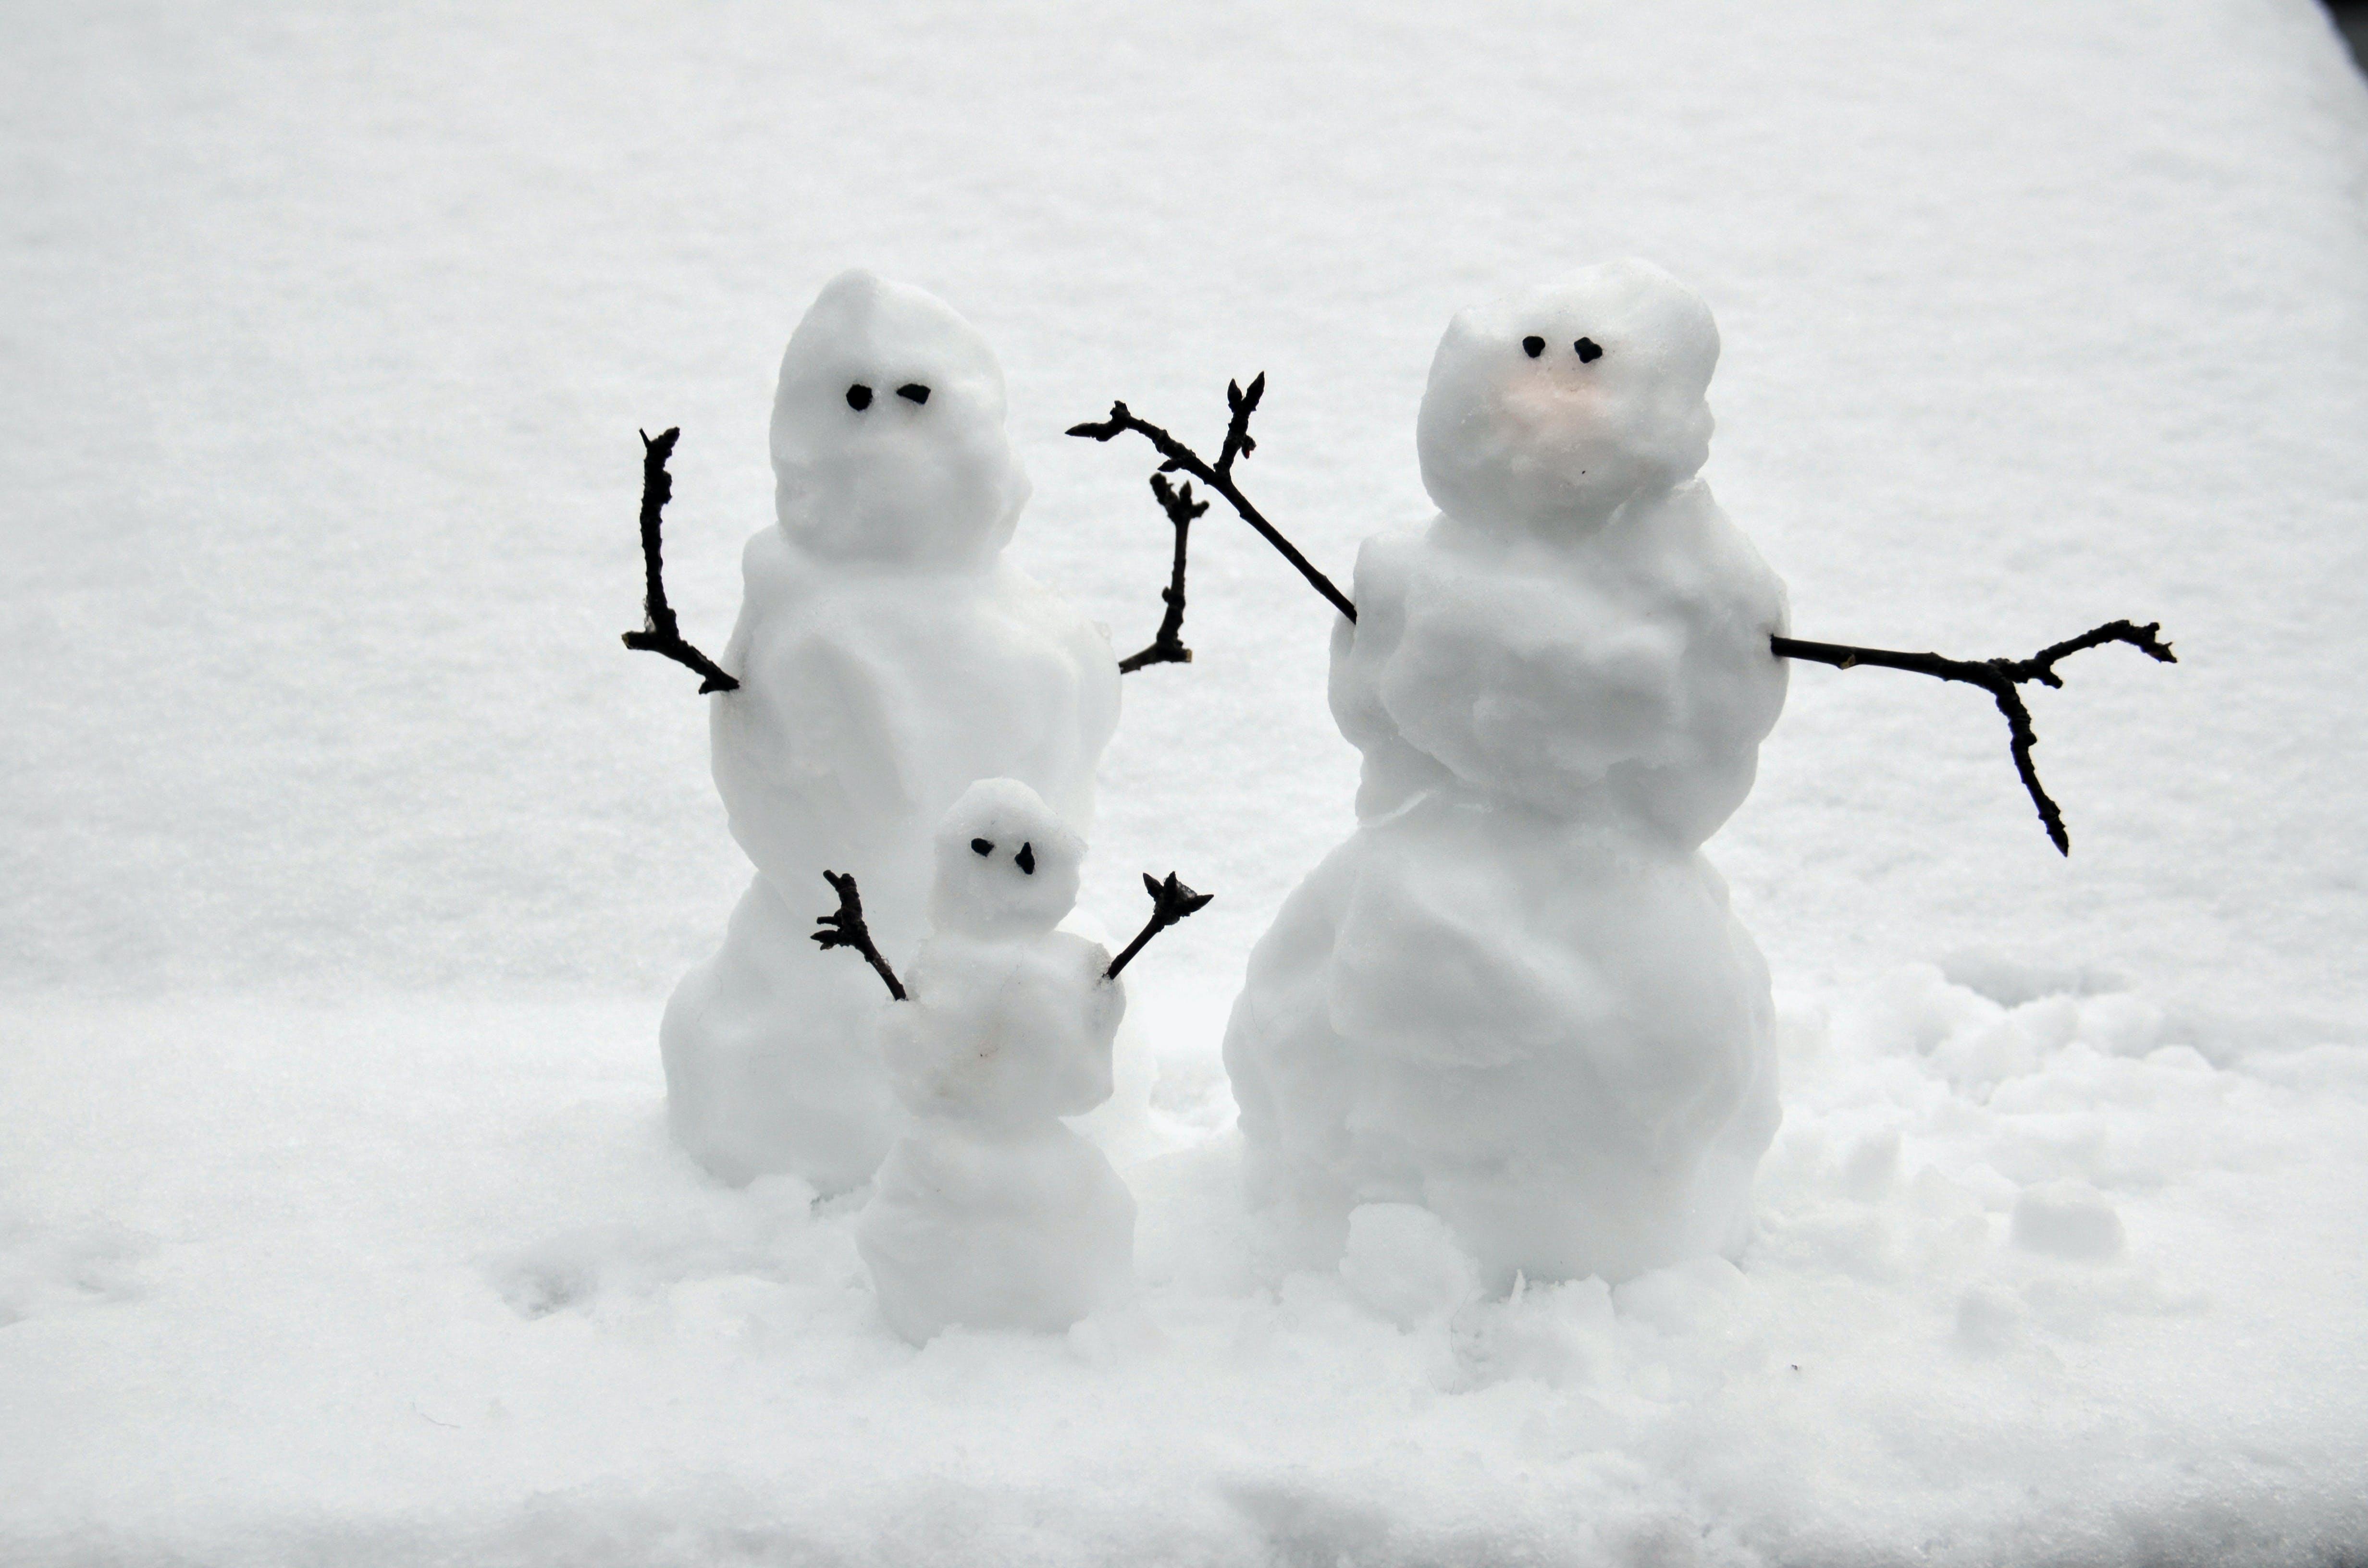 Free stock photo of snow, snowman, snowmen, winter